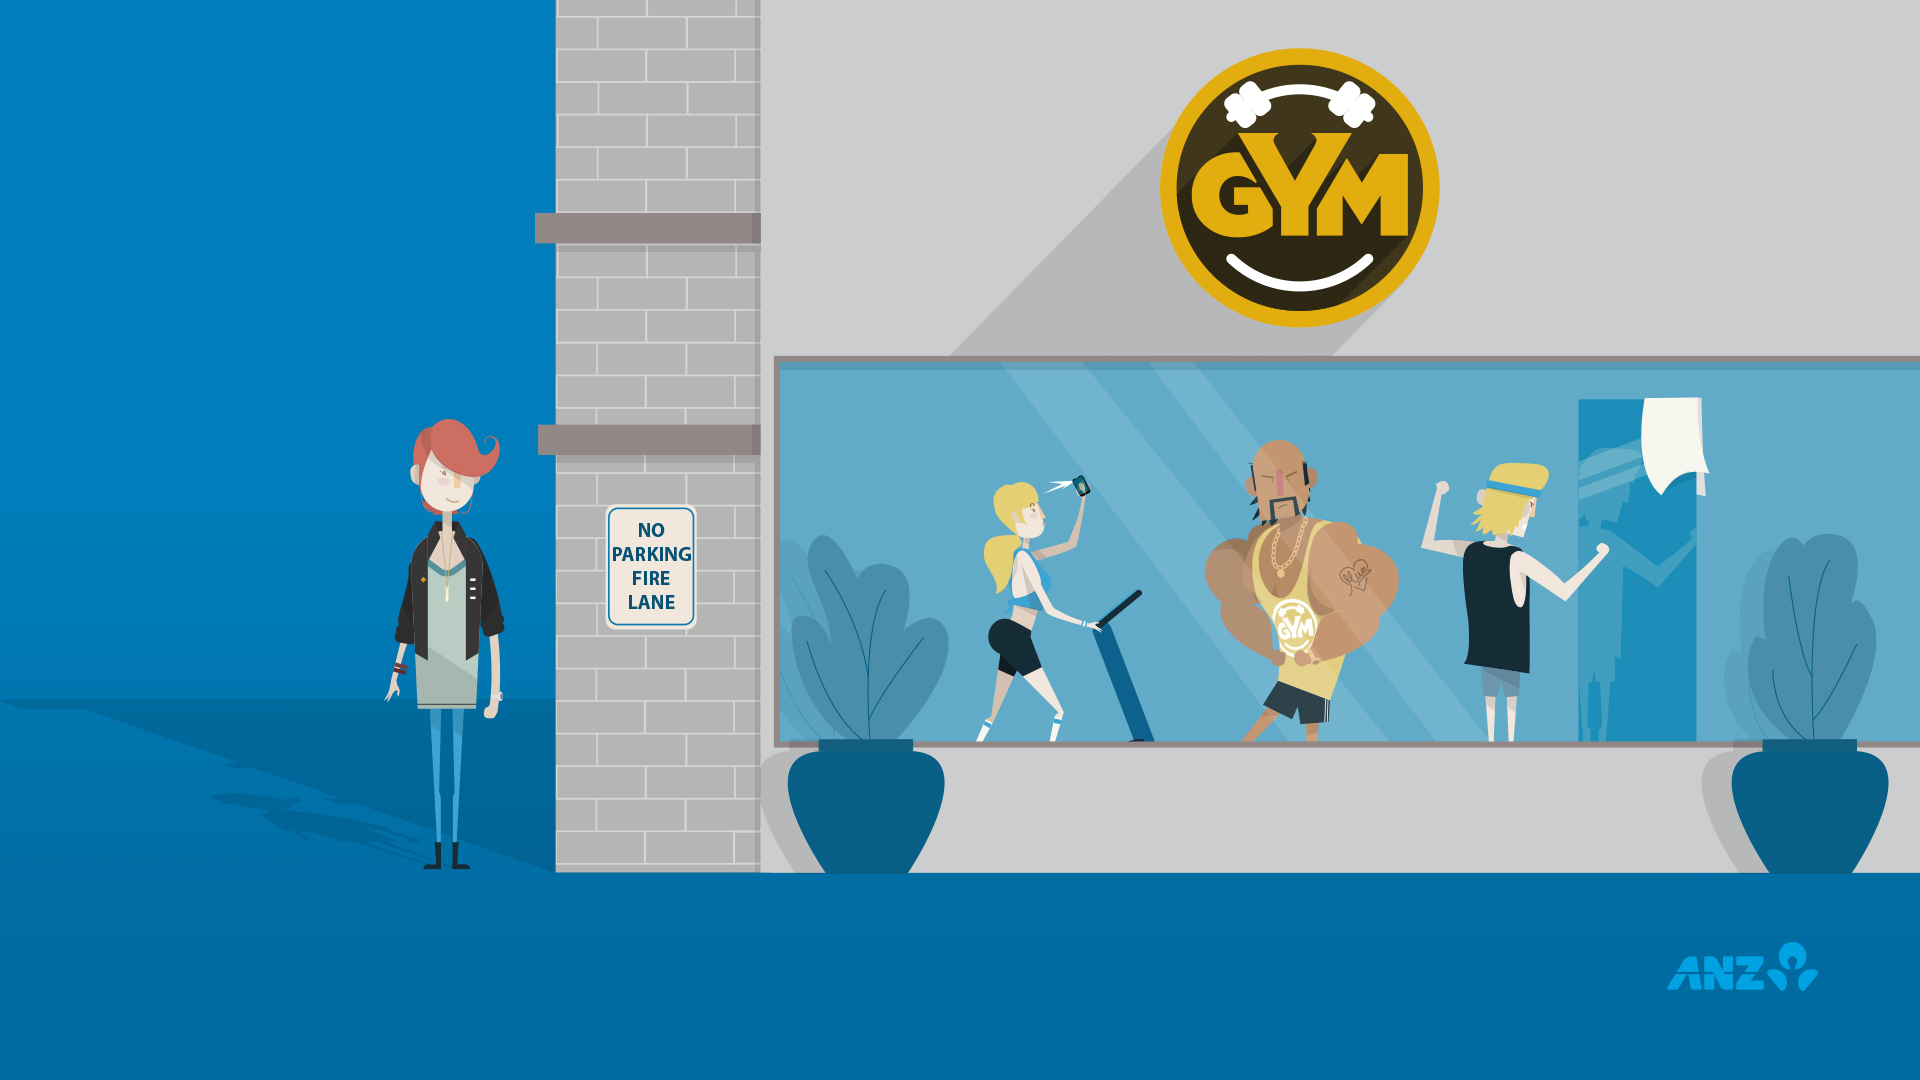 gym_outdoor.jpg